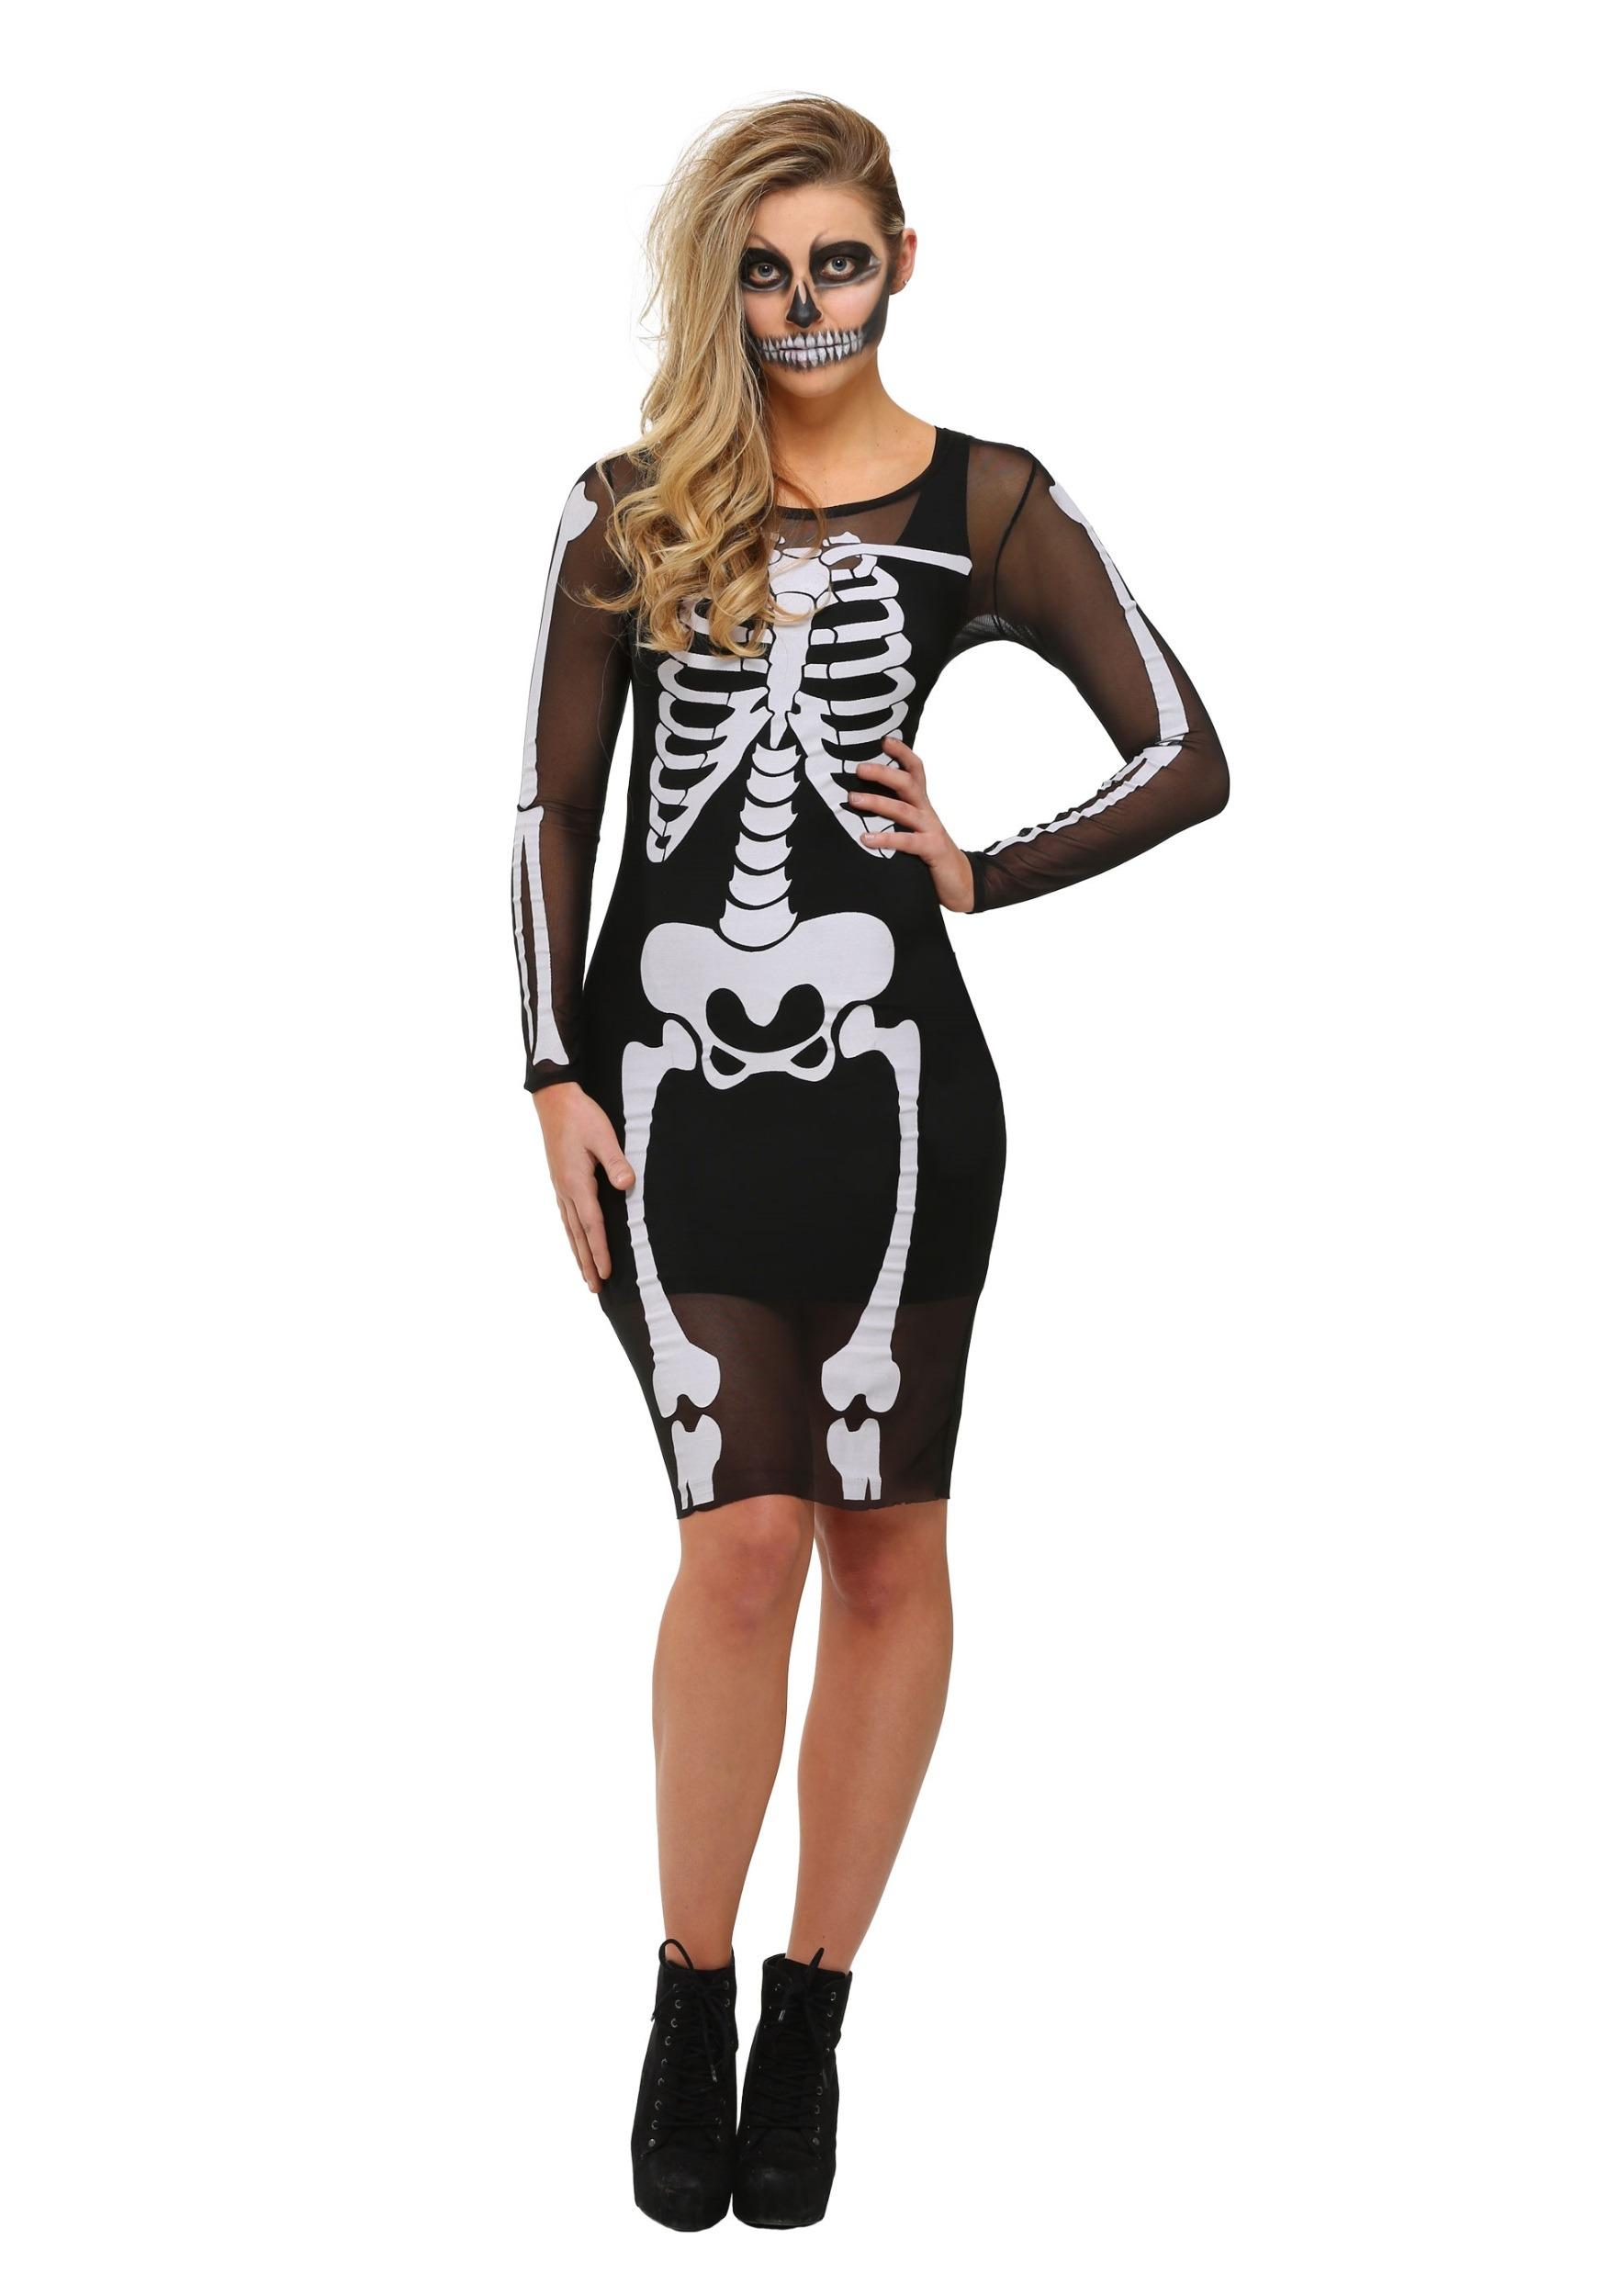 Mesh Skeleton Plus Size Dress Costume